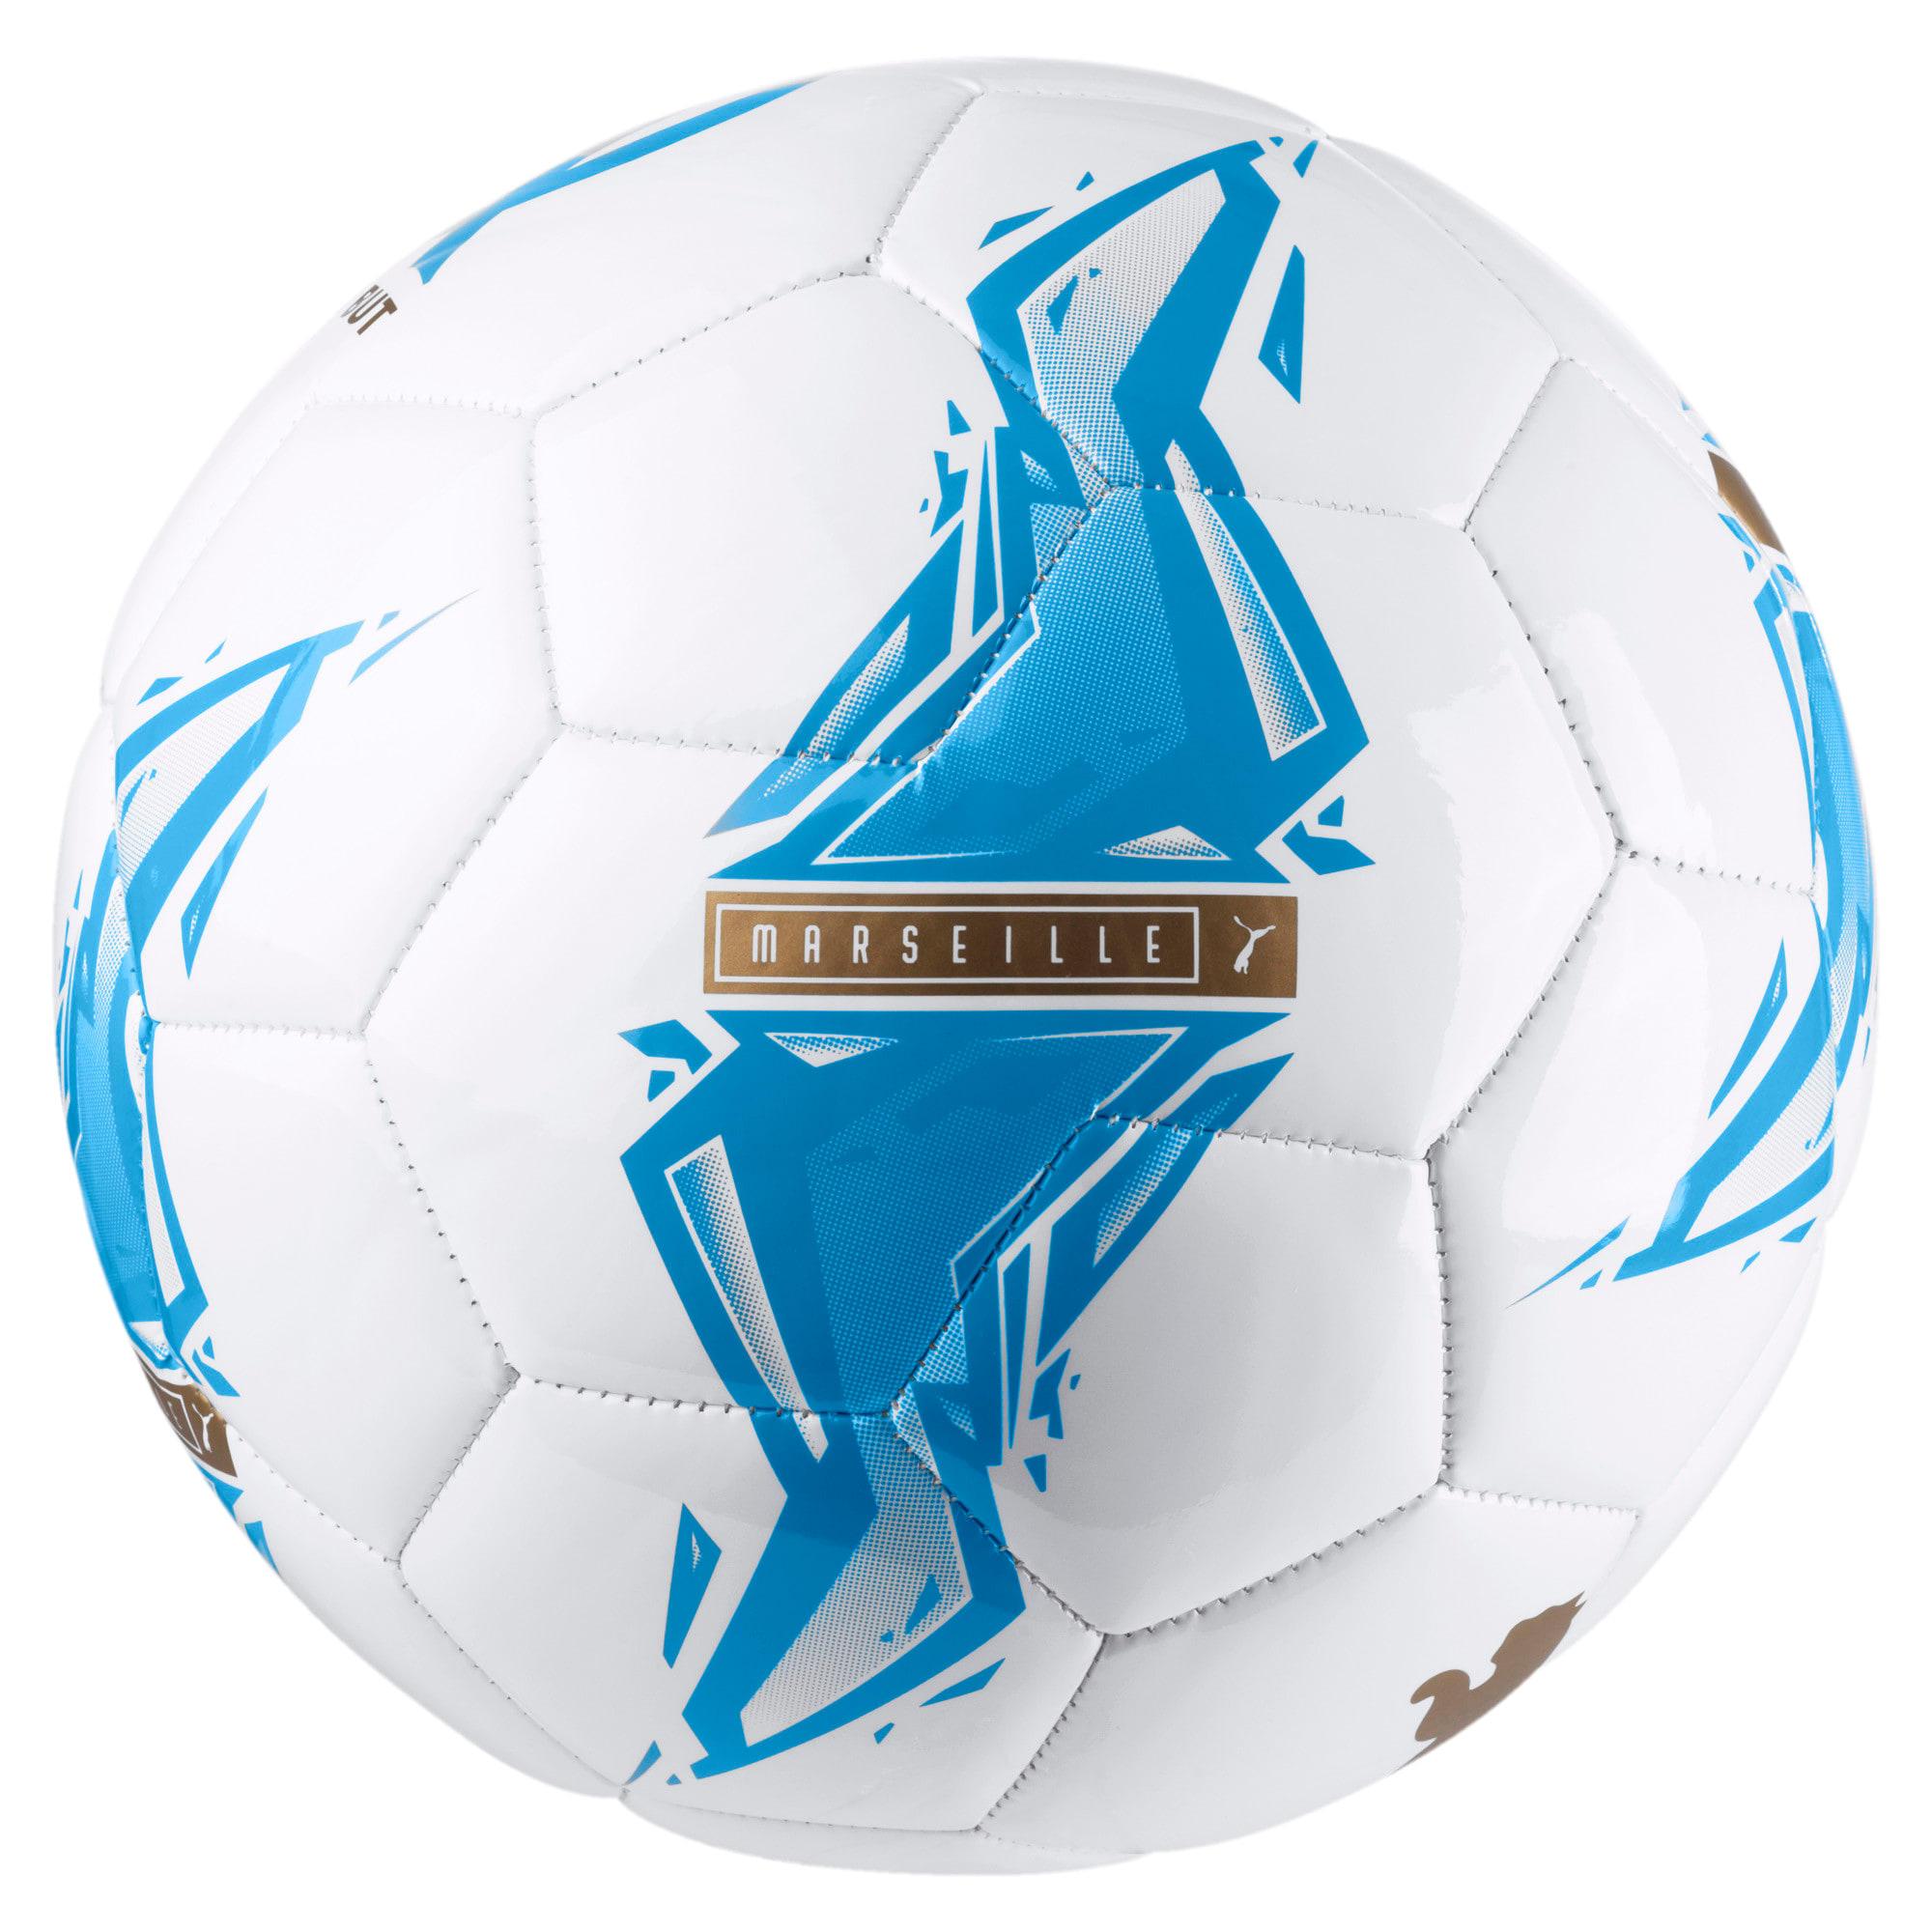 Thumbnail 2 of Olympique de Marseille Fan Ball, Bleu Azur-Puma White, medium